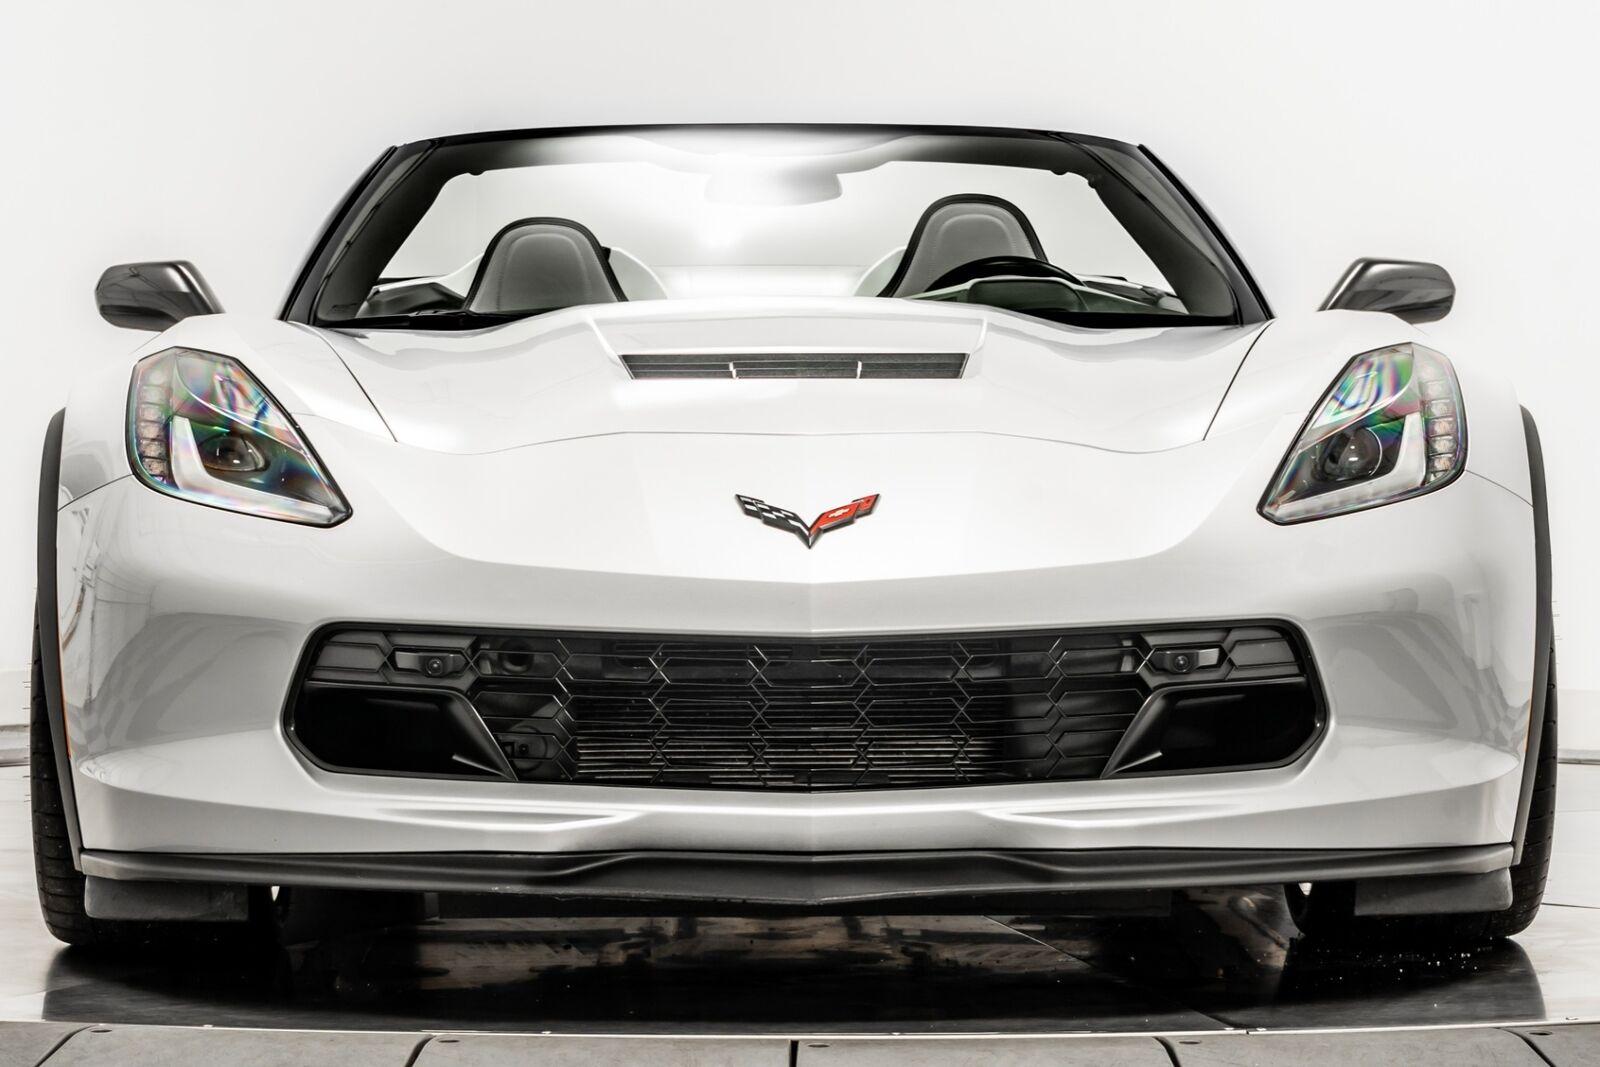 2019 Silver Chevrolet Corvette Grand Sport 2LT | C7 Corvette Photo 3